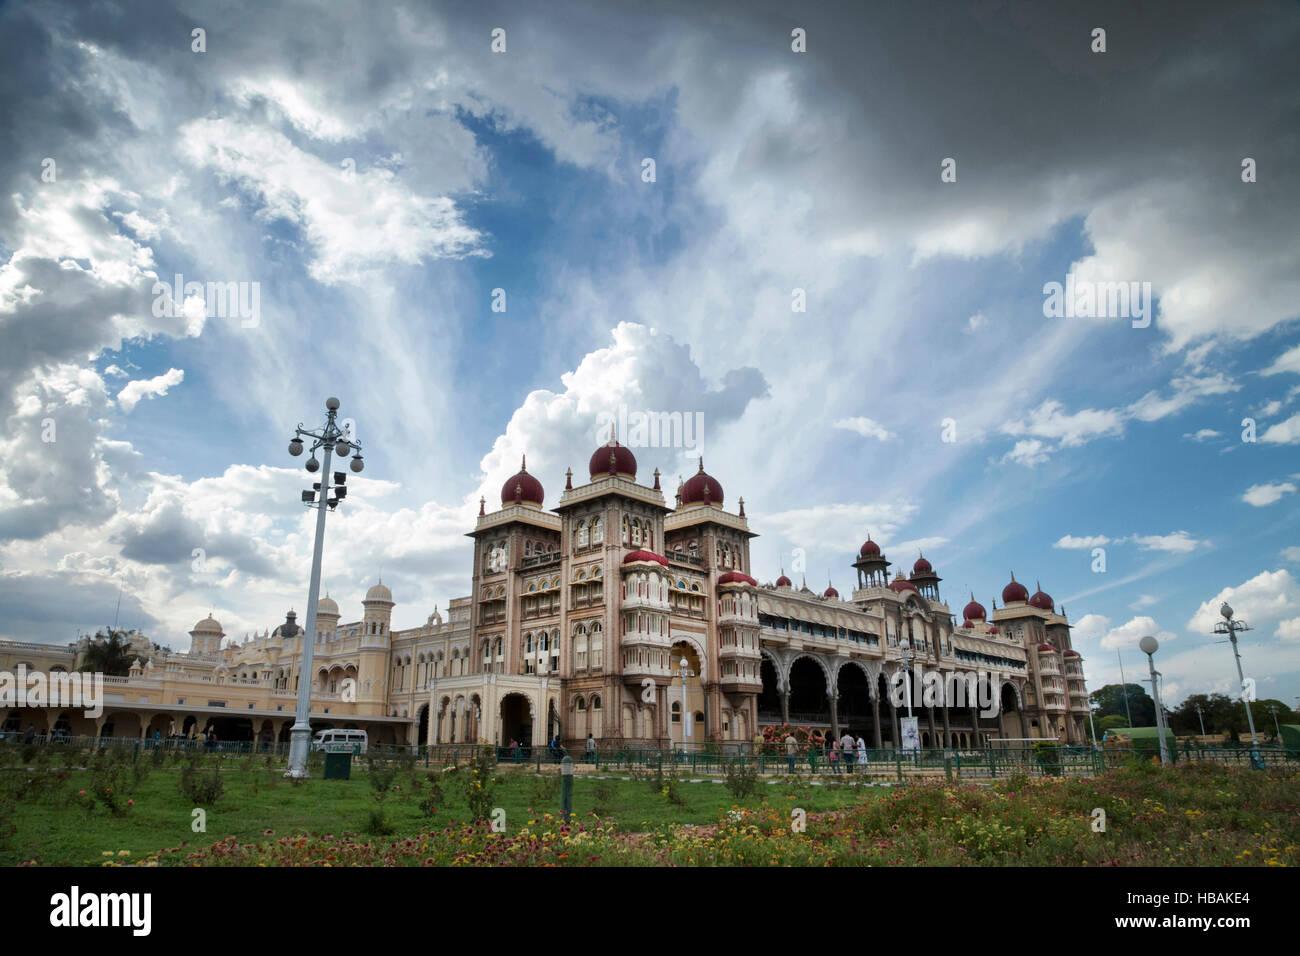 The Palace of Mysore, Mysore, Karnataka India. Official residence of the Wodeyars — rulers of Mysore. It houses - Stock Image